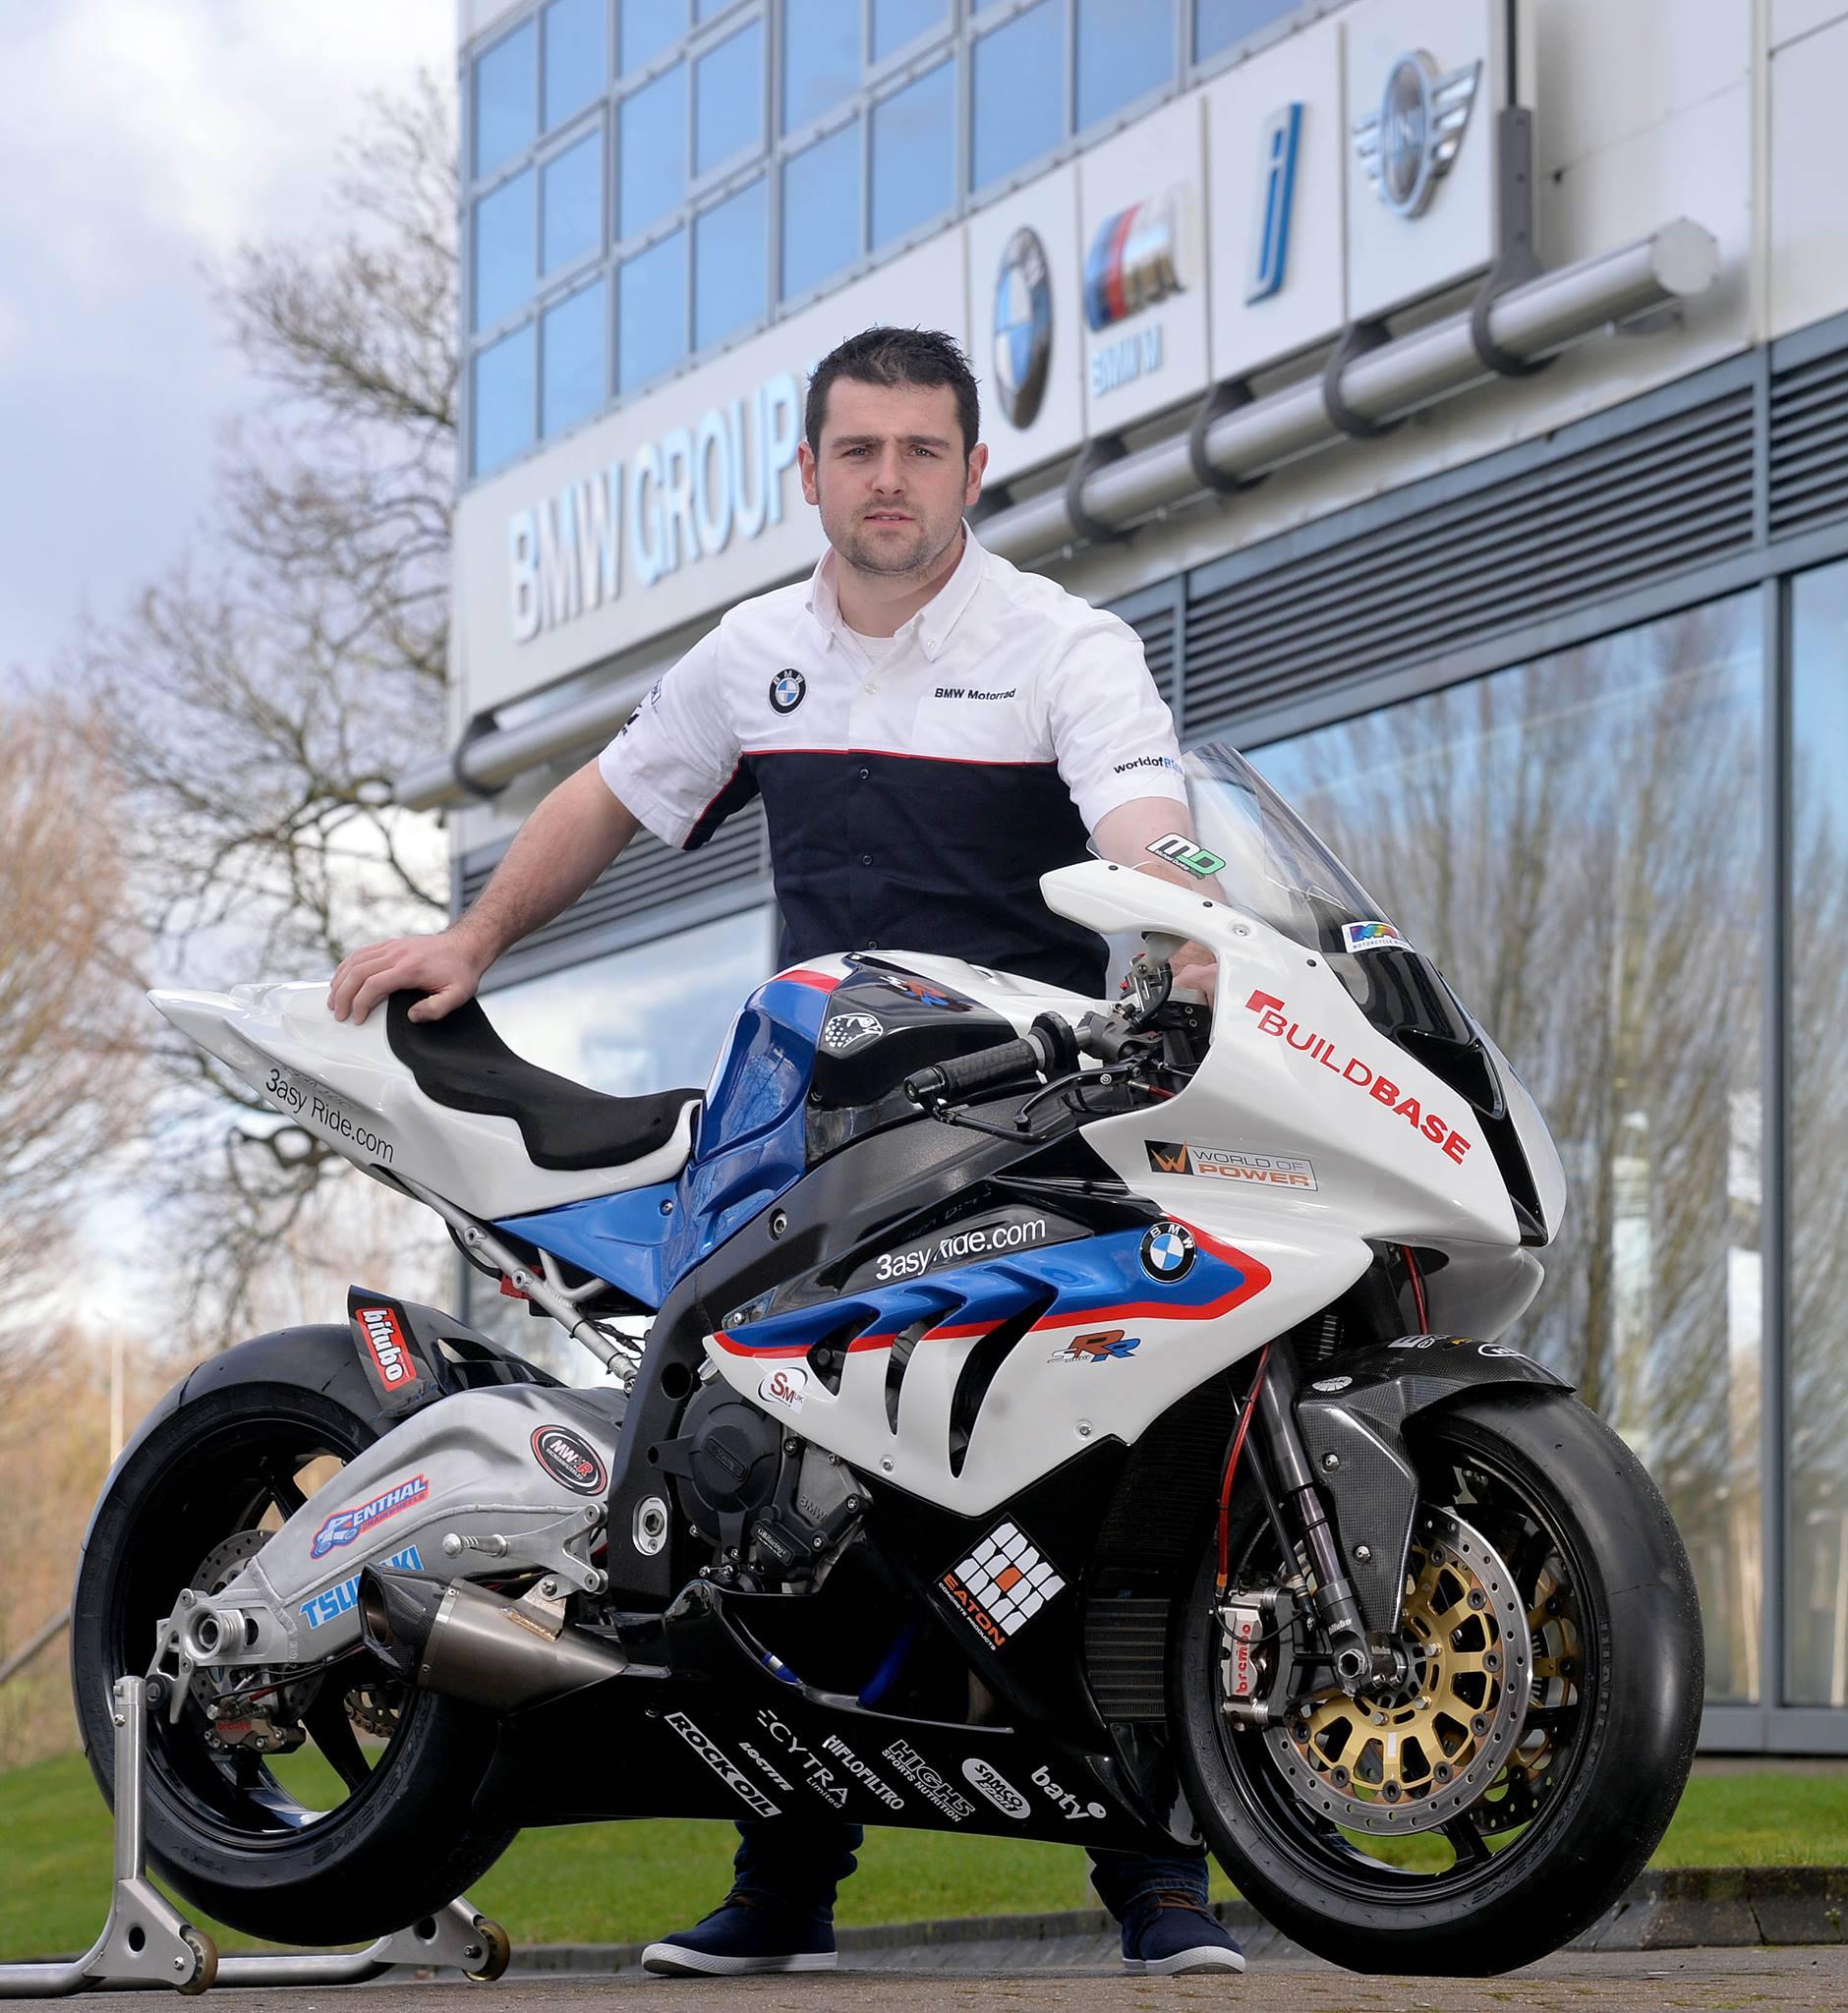 Dunlop in BMW per la stagione 2014